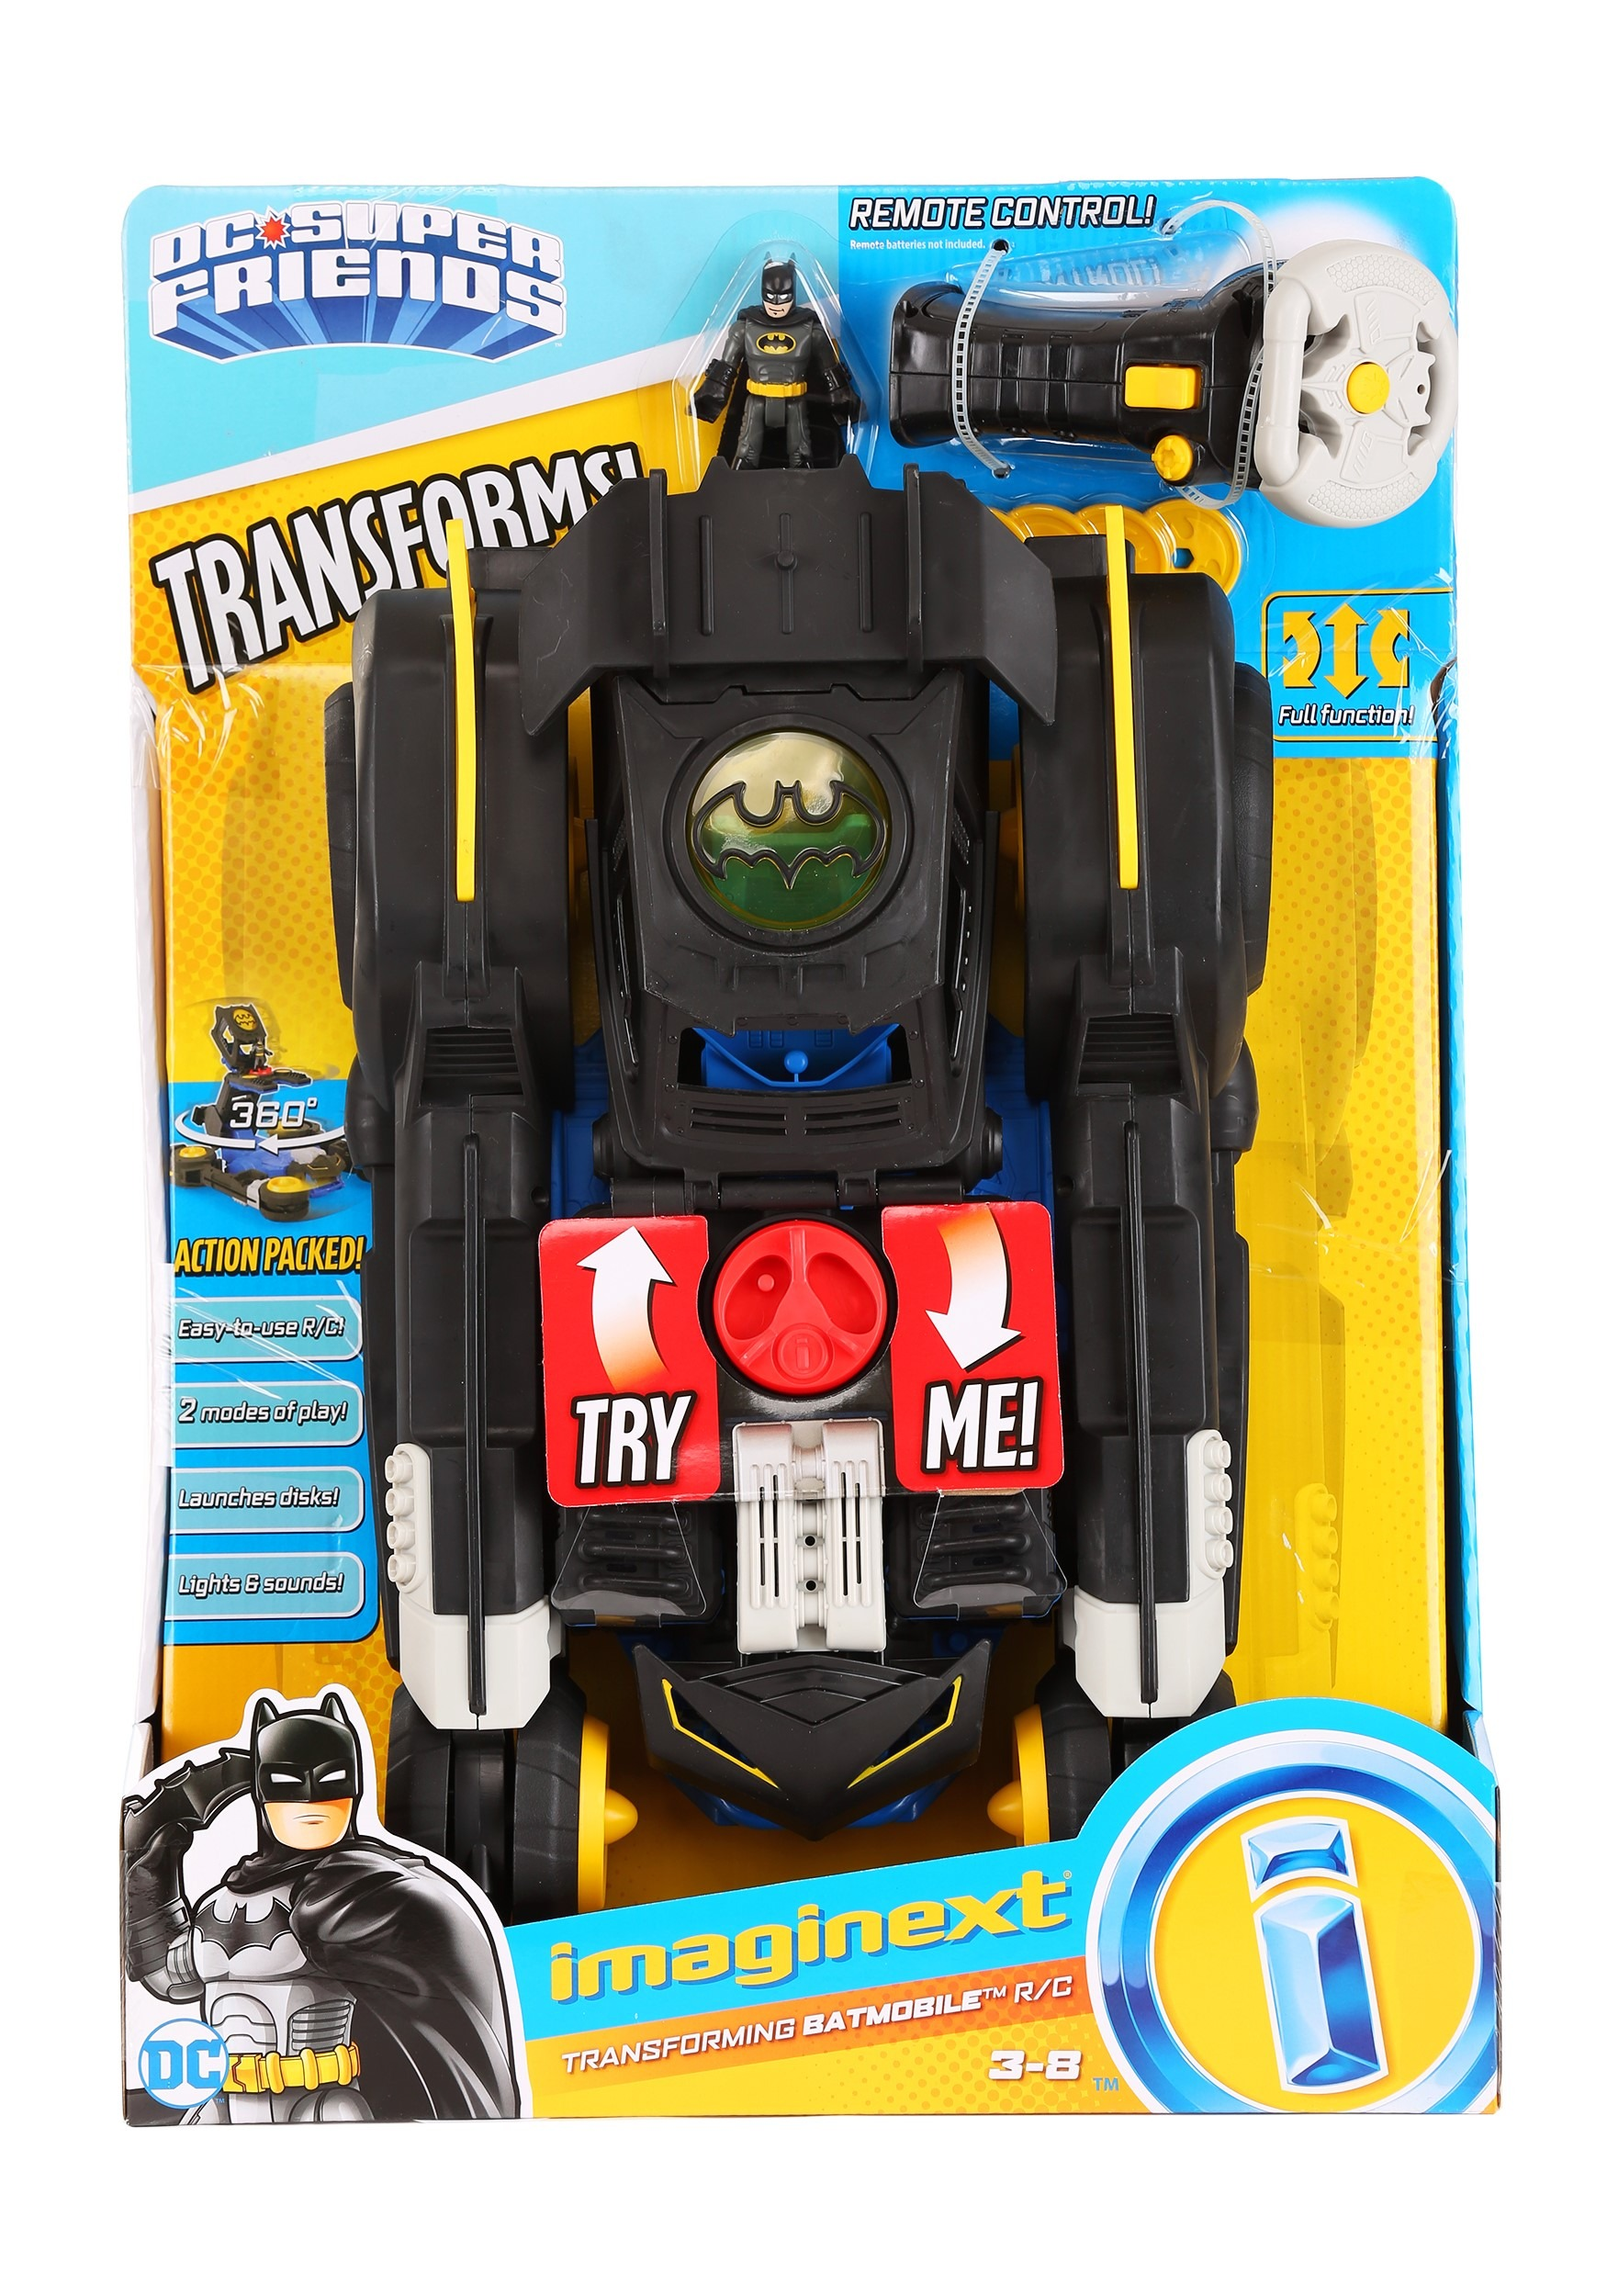 DC Batman Remote Control Ultimate Batmobile